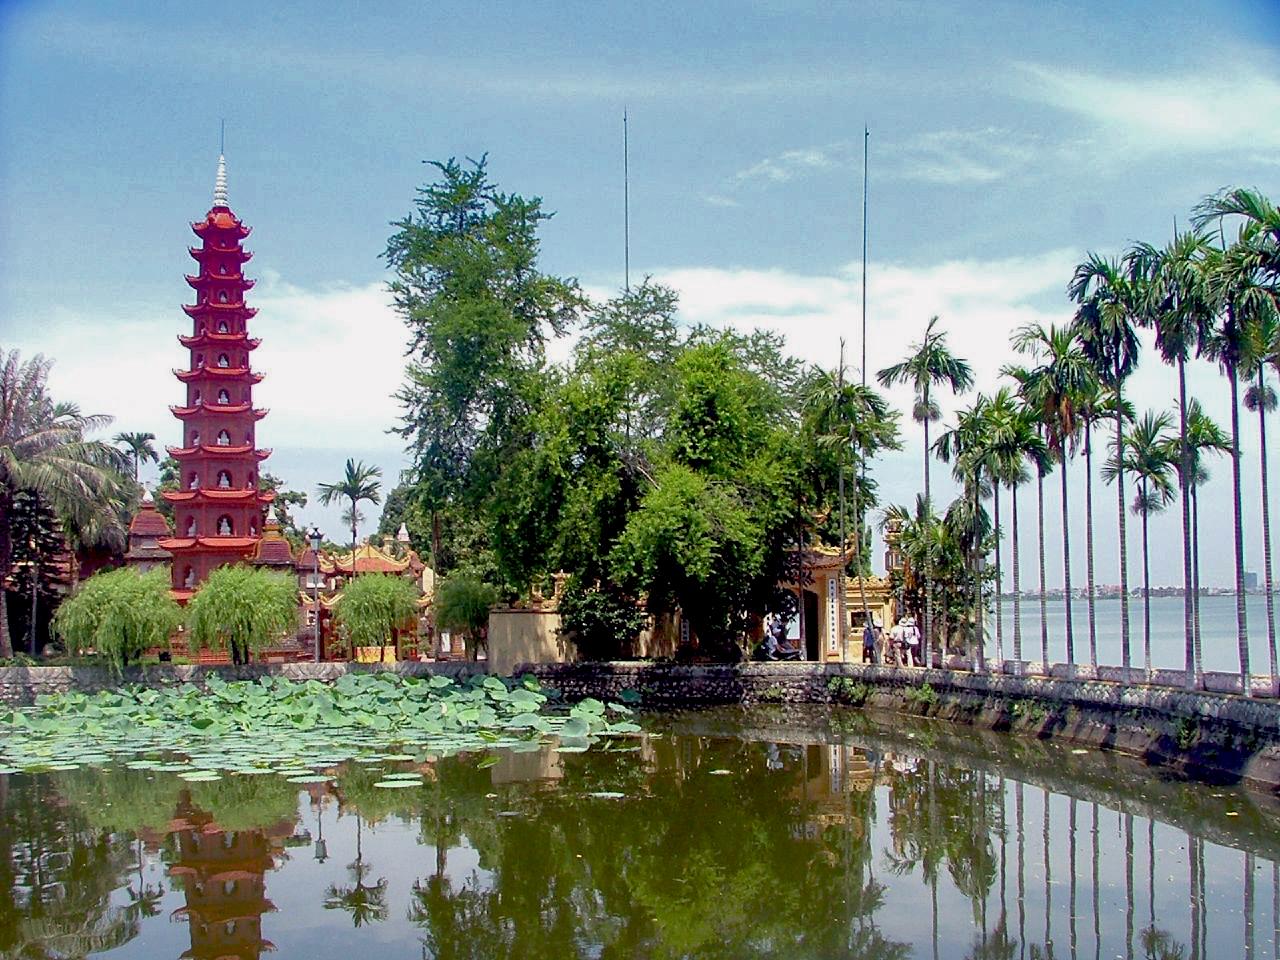 By Тханг Нгуен (изначально опубликованное на Flickr , как DSCF2931) [CC BY-SA 2.0], via Wikimedia Commons